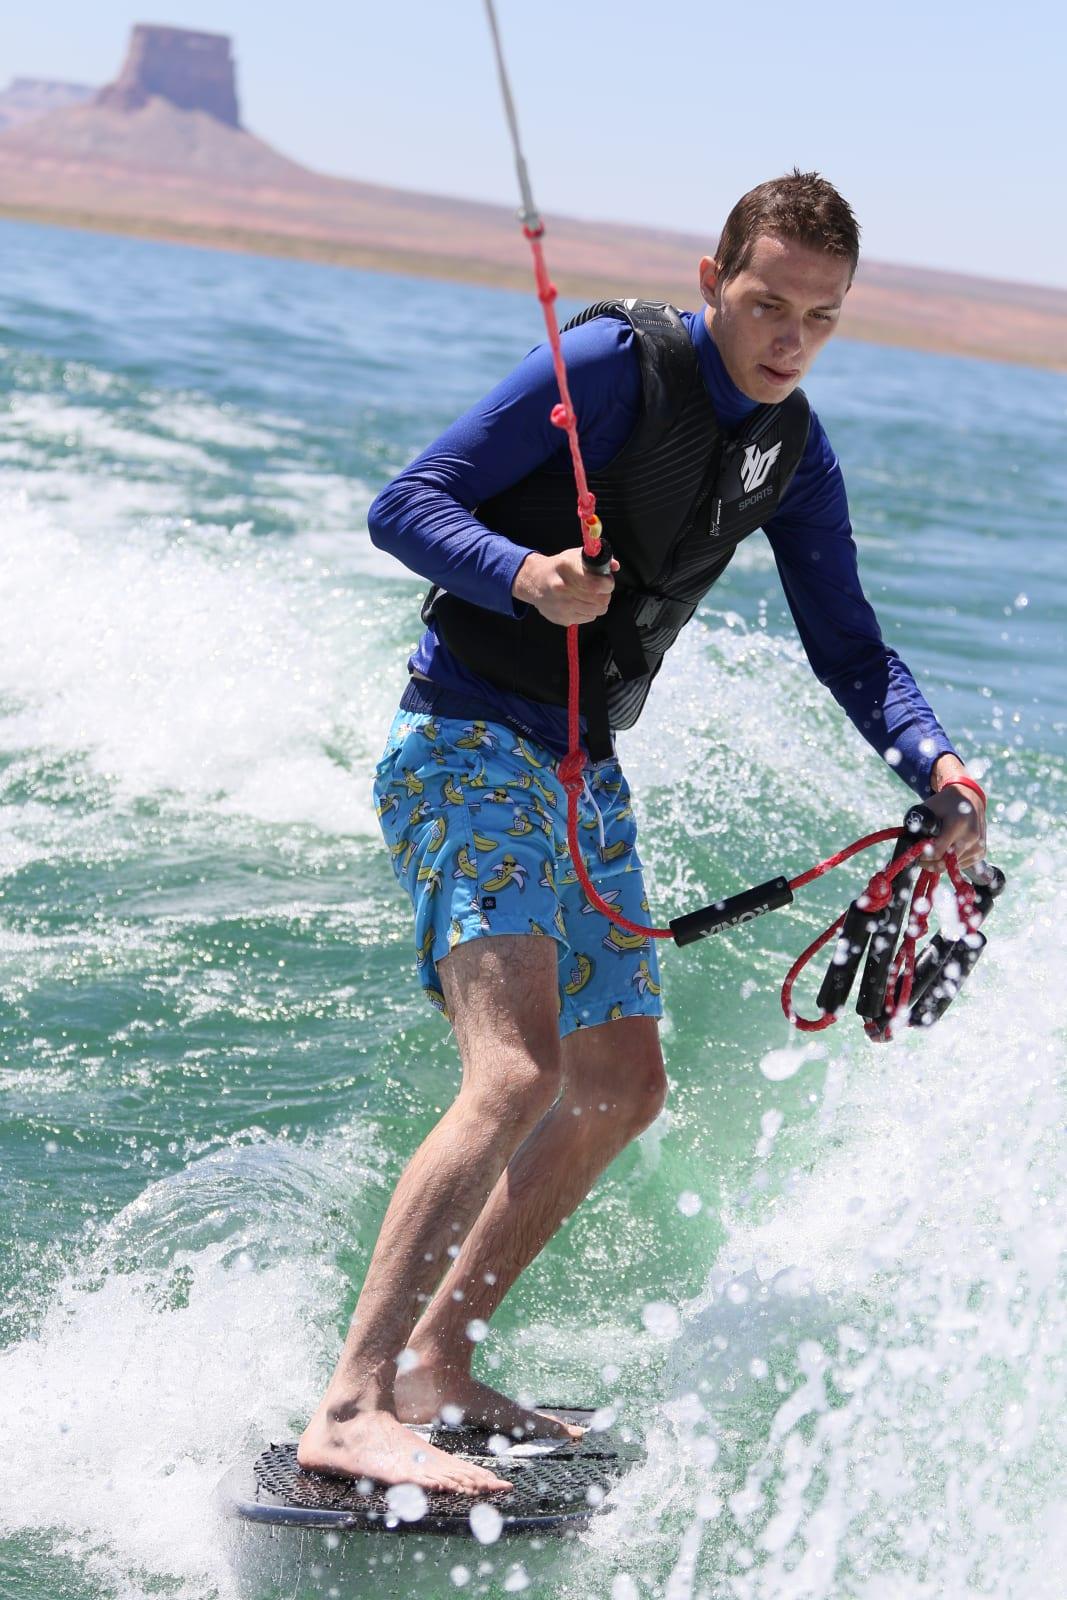 Luke surfing at Lake Powell after 4 brain surgeries. Amazing.